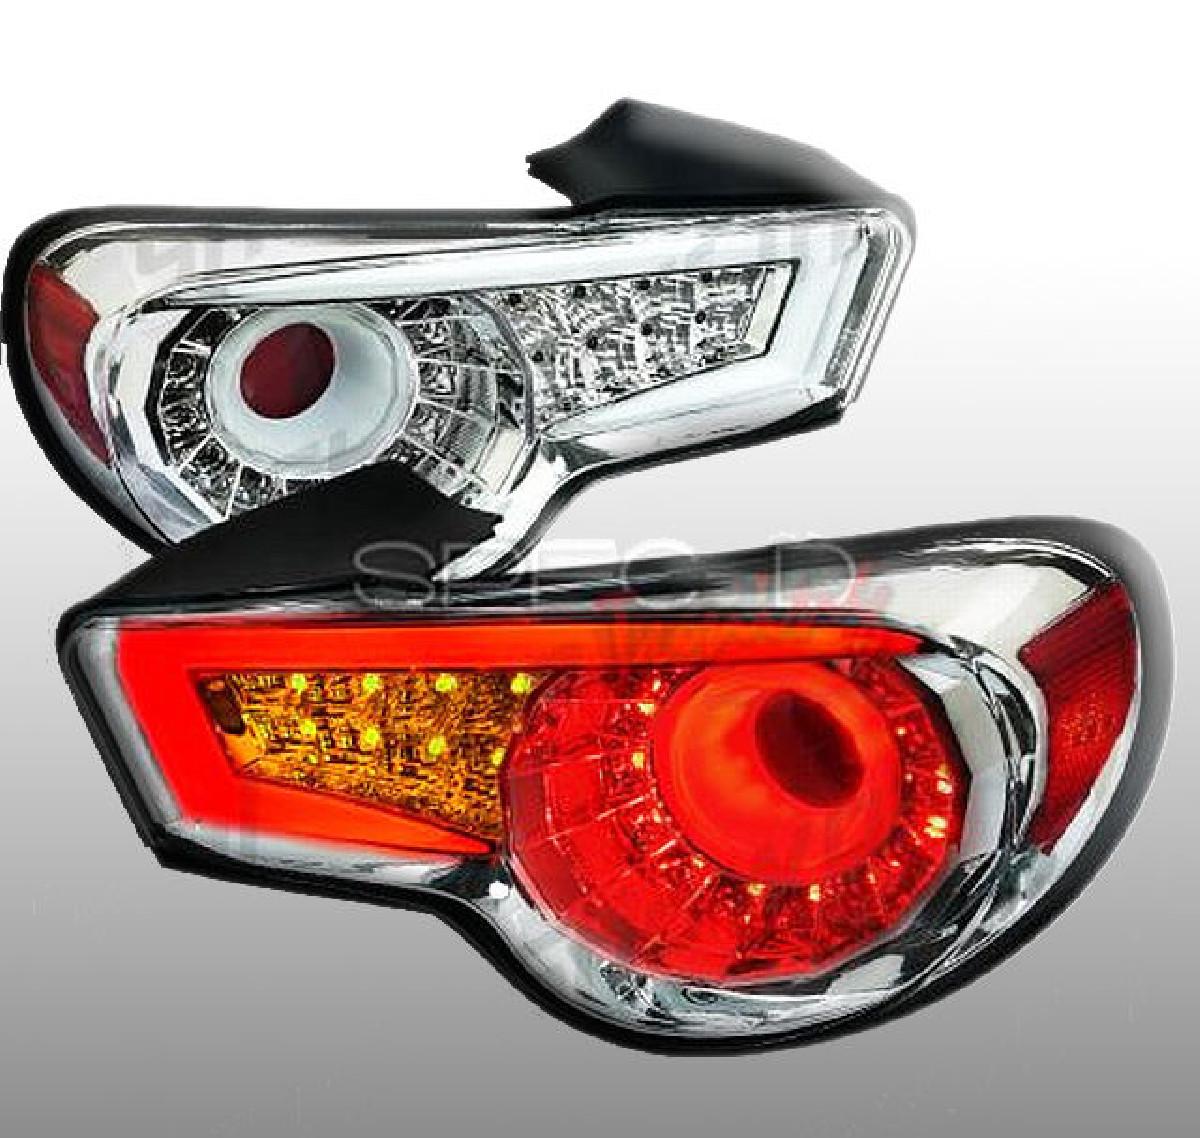 LED Rückleuchten Toyota GT86 Chrom/Klar